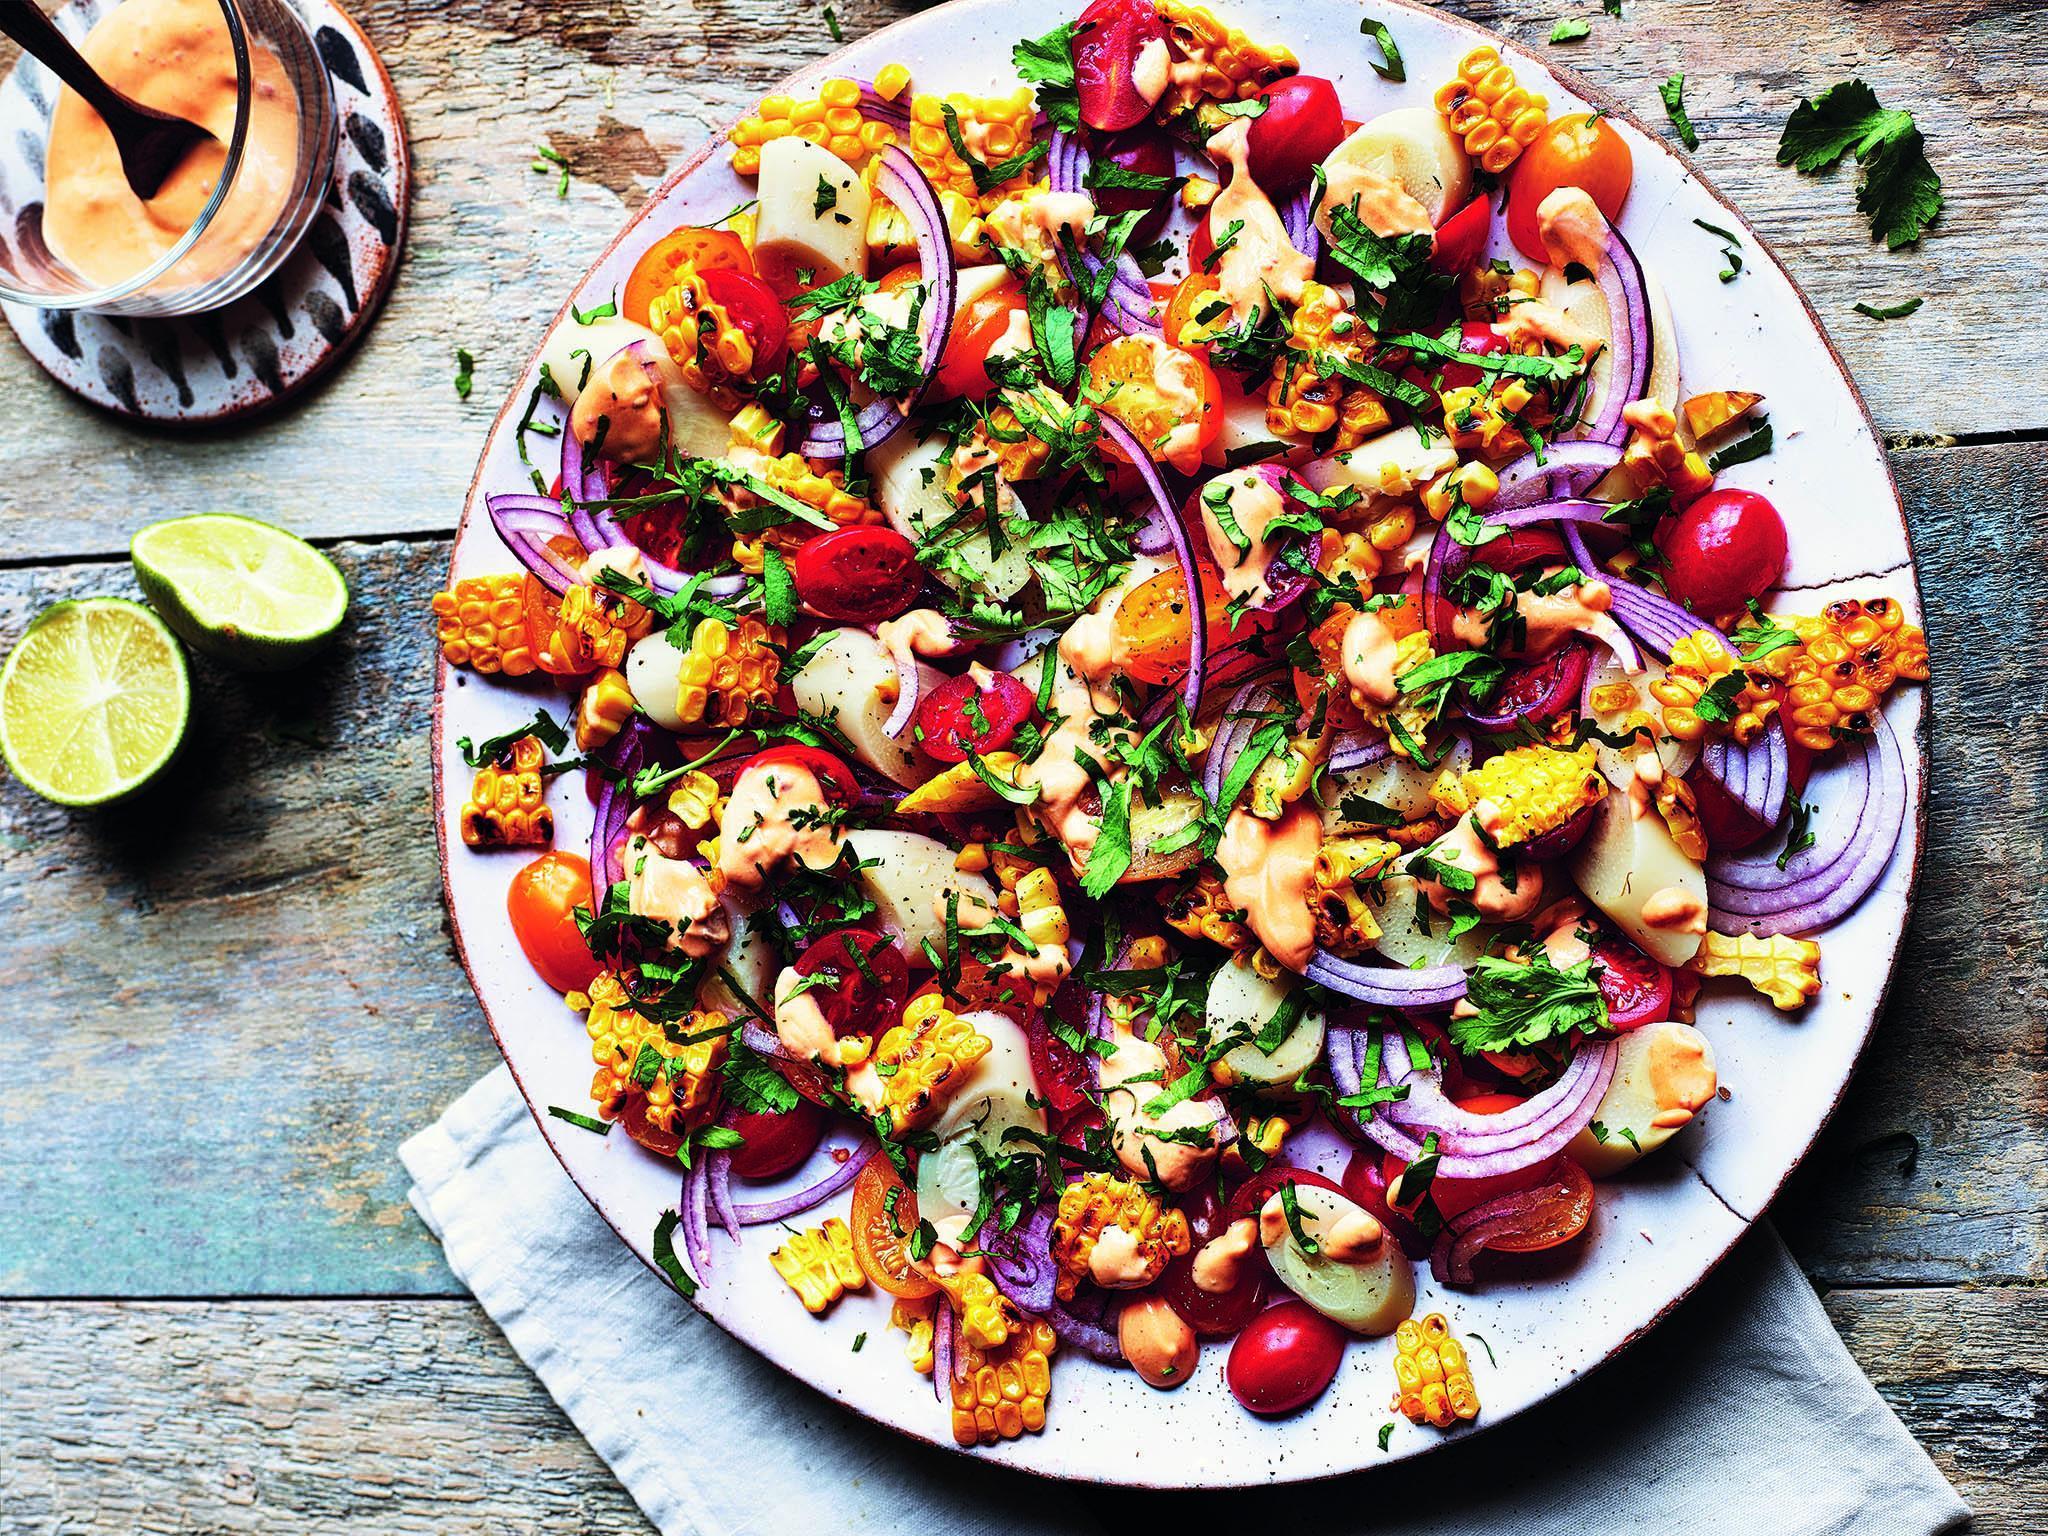 Sabrina Gayhour's 'Bazaar' cookbook: Recipes from sweetcorn salad to sumac tomato toast 1